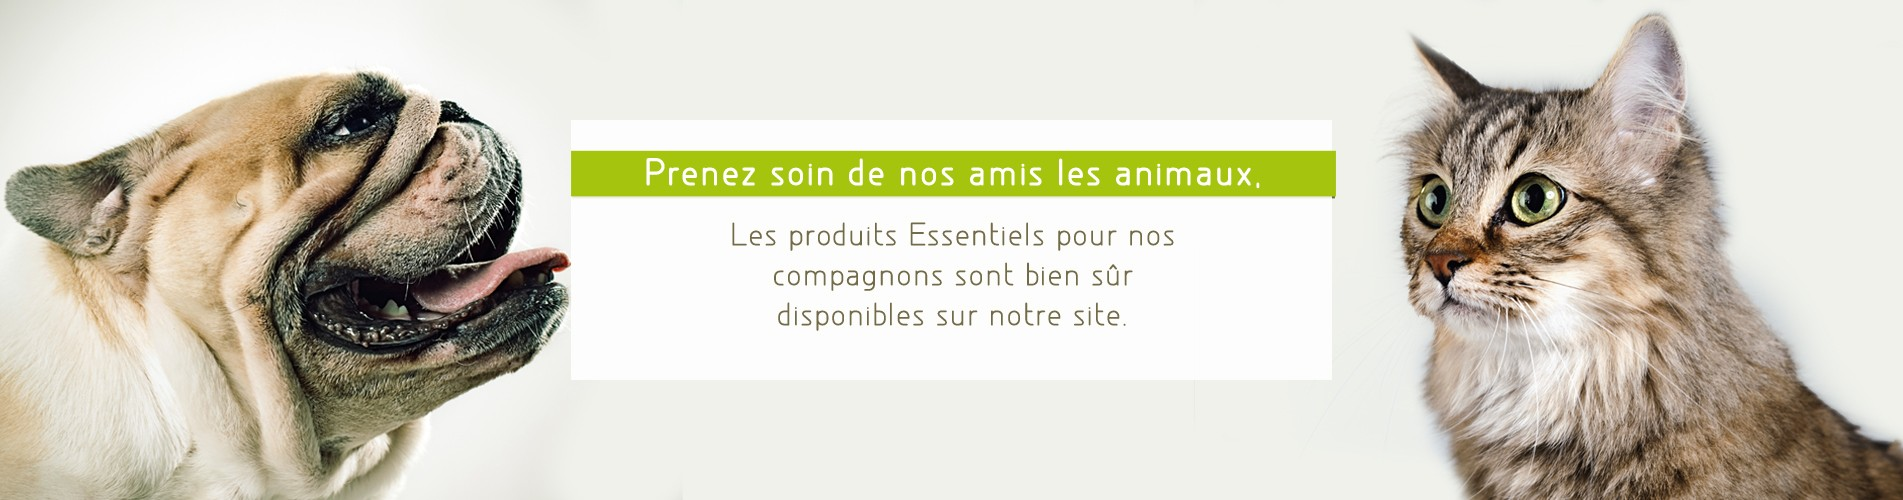 nos_amis_les_animaux